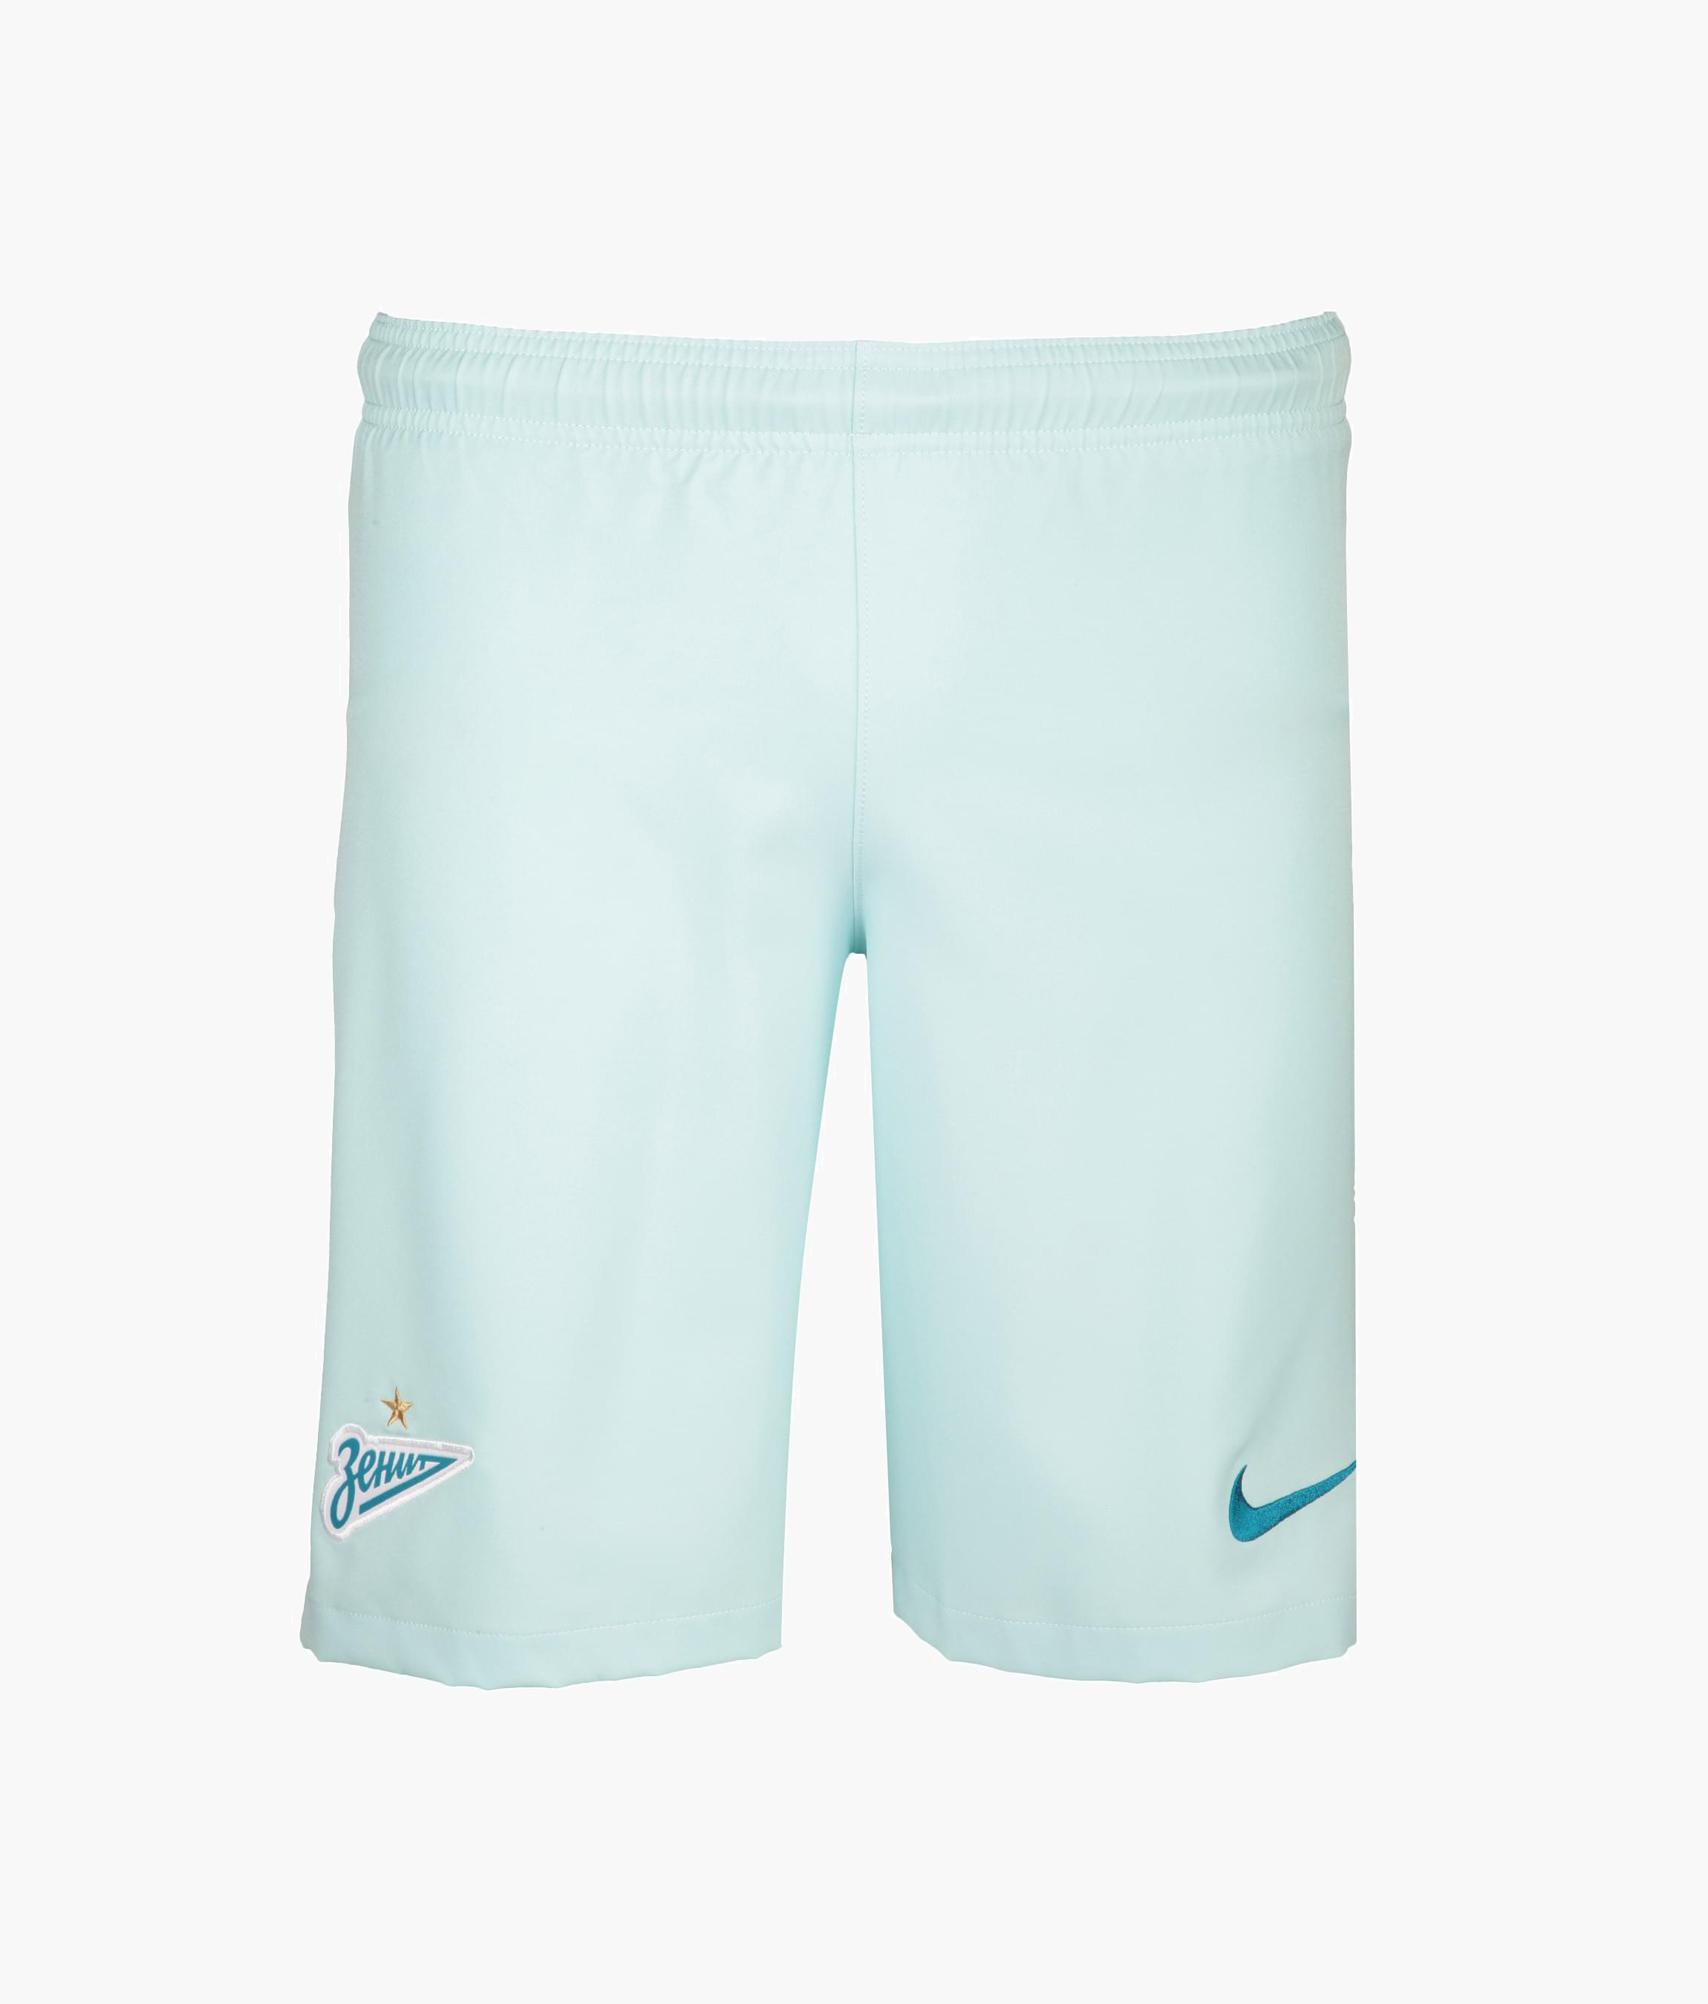 Шорты выездные Nike Nike шорты mustang 1005668 5000 883